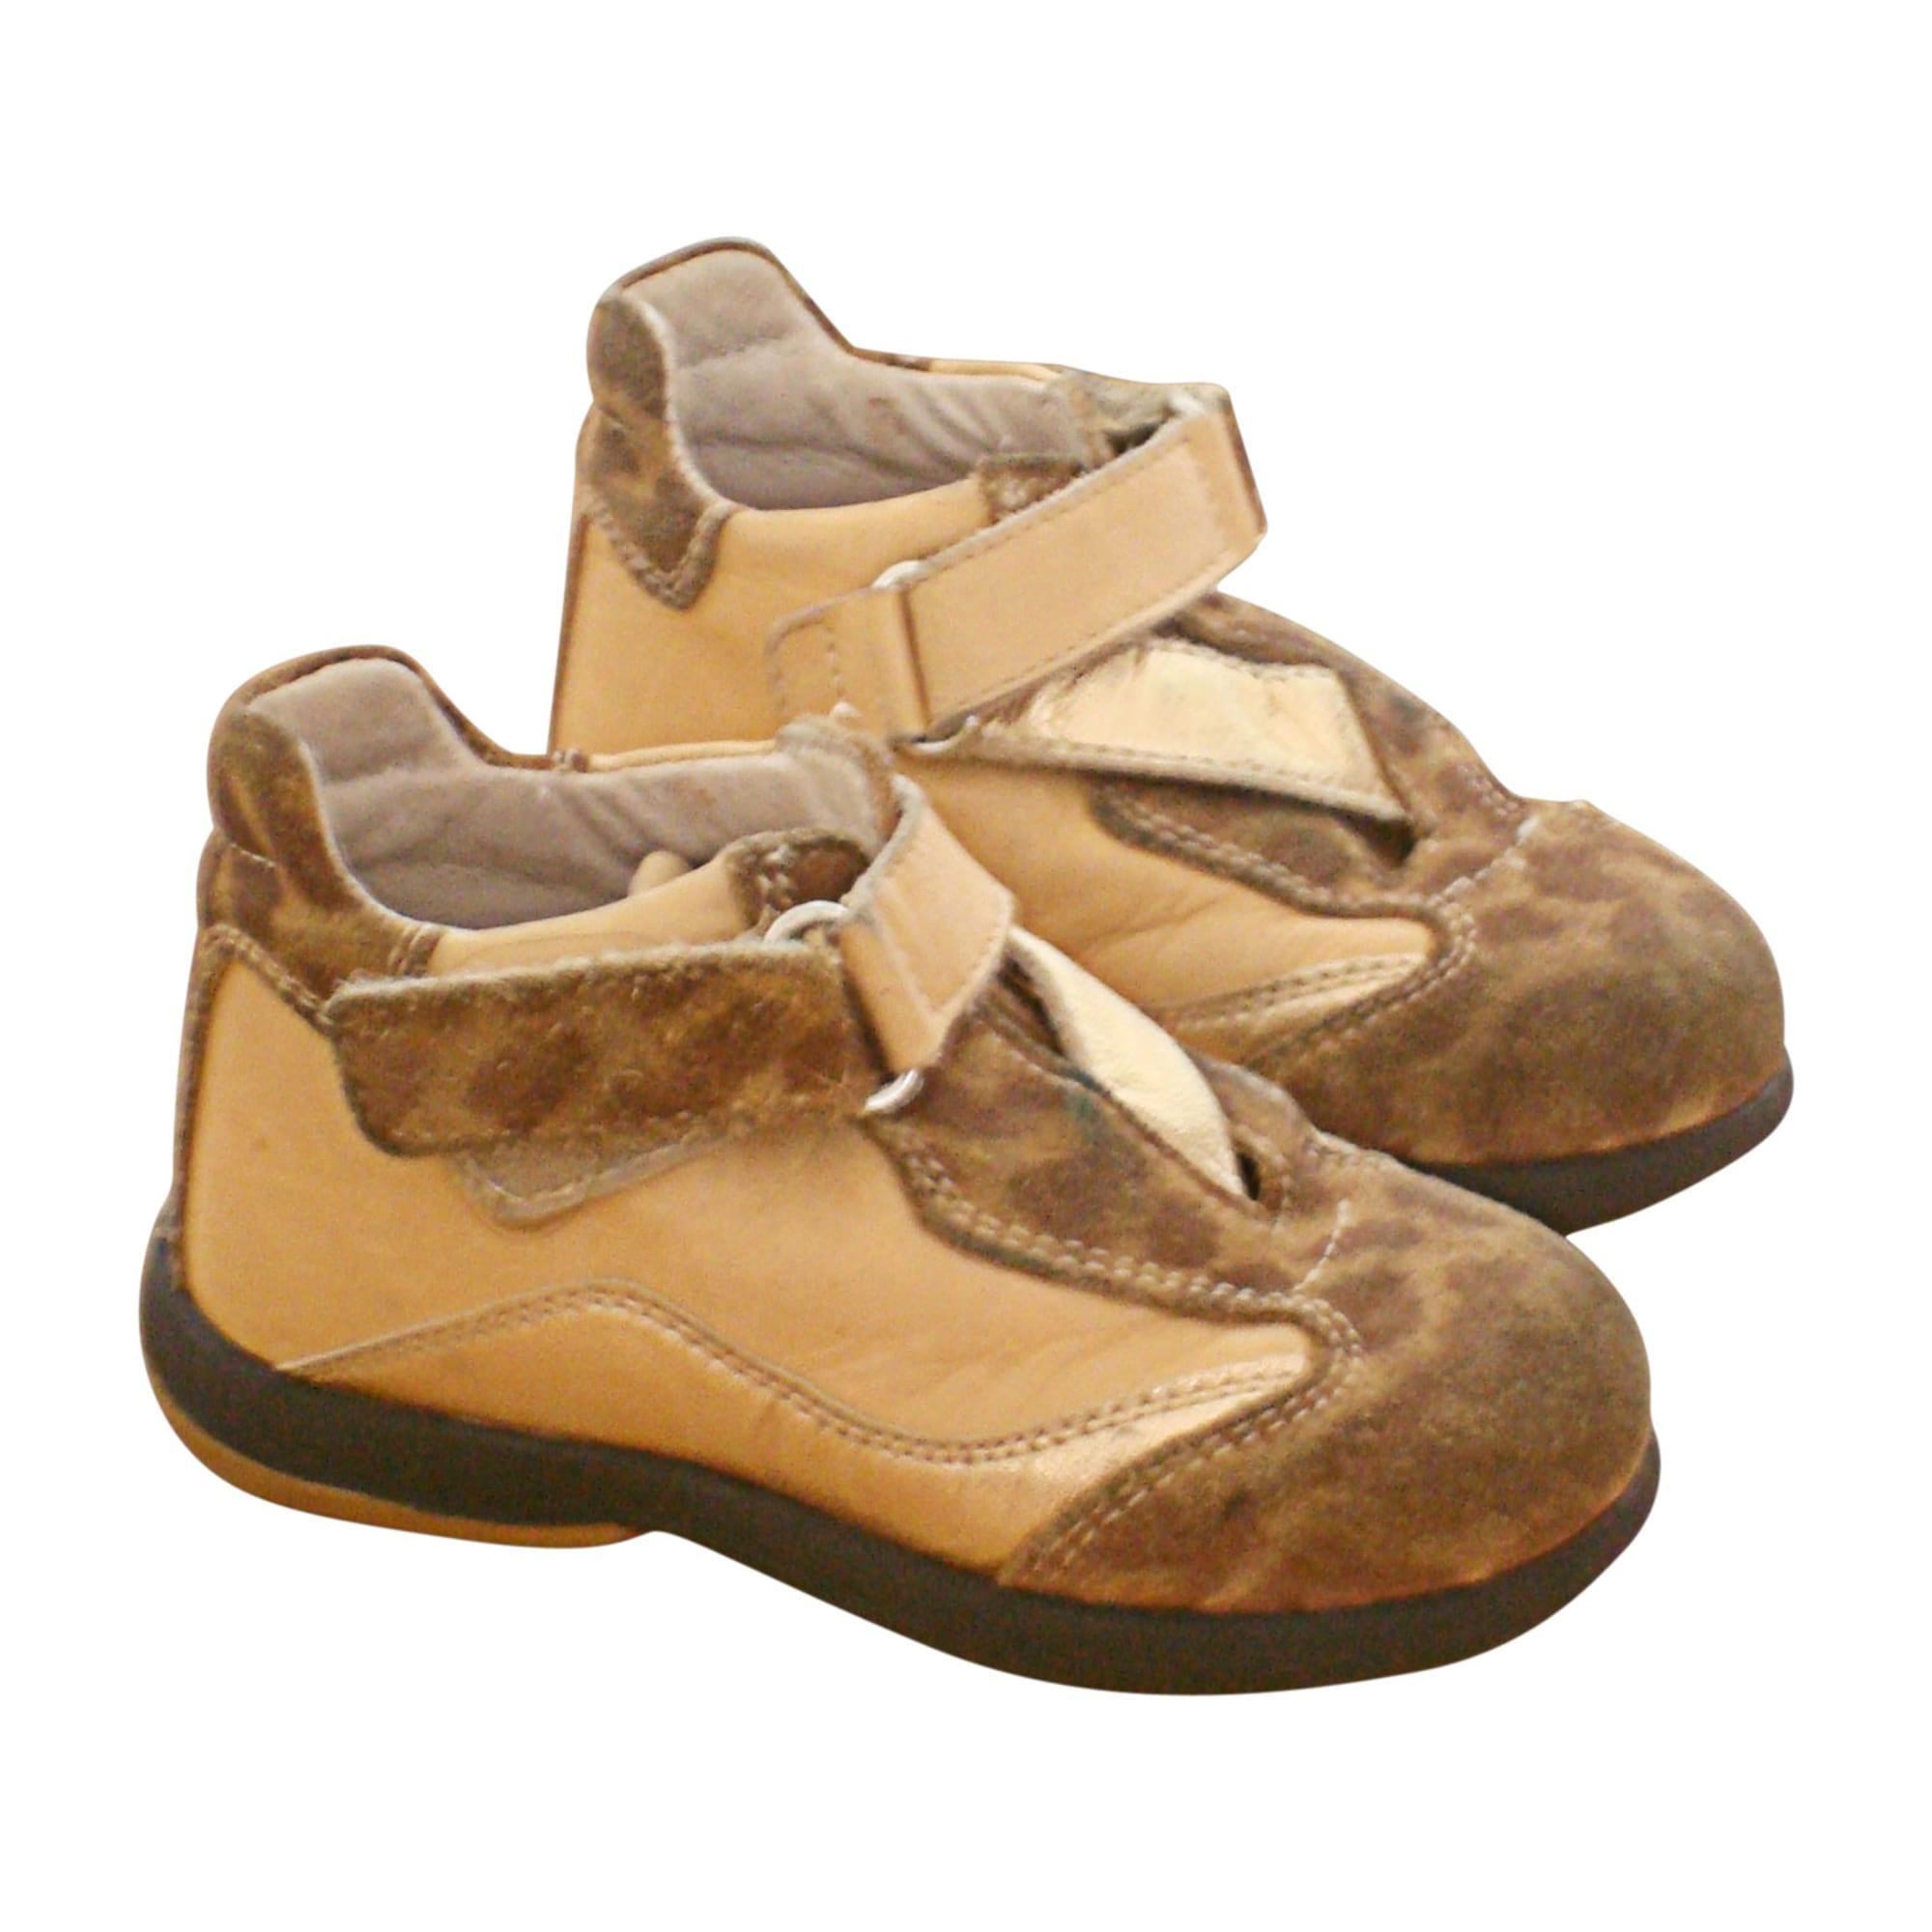 Ankle Boots MARQUE INCONNUE Golden, bronze, copper